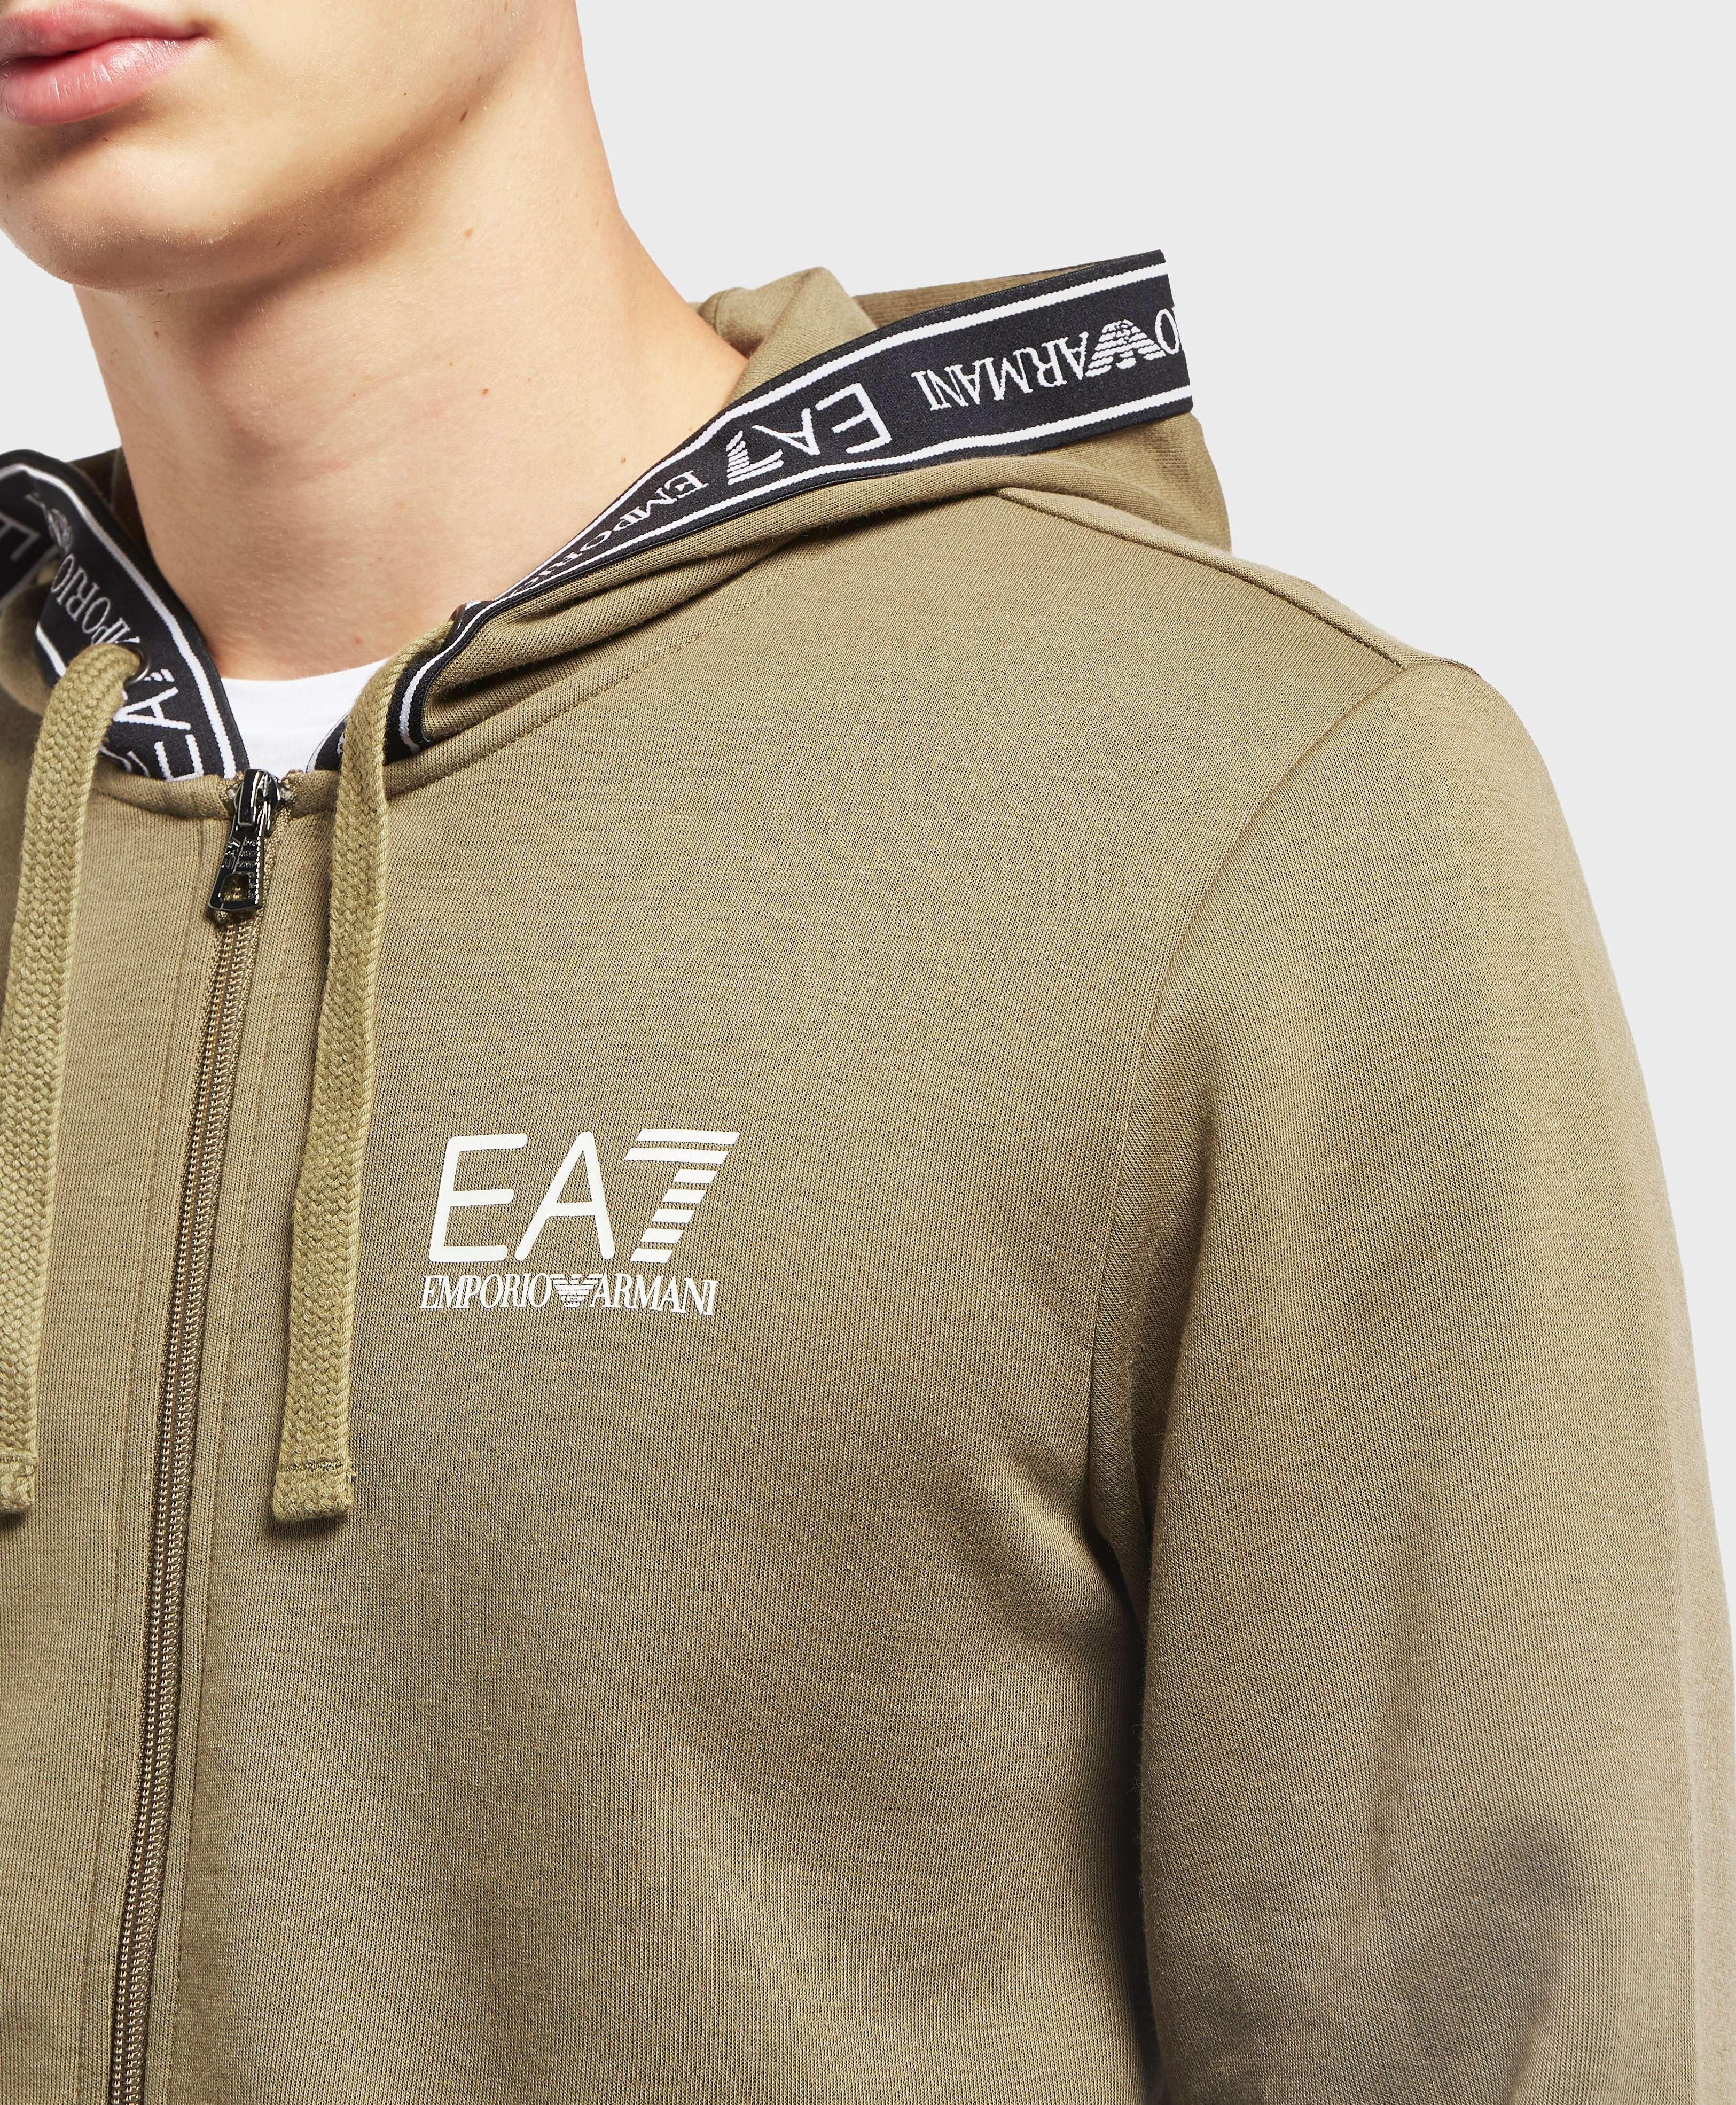 Emporio Armani EA7 Tape Full Zip Hoodie